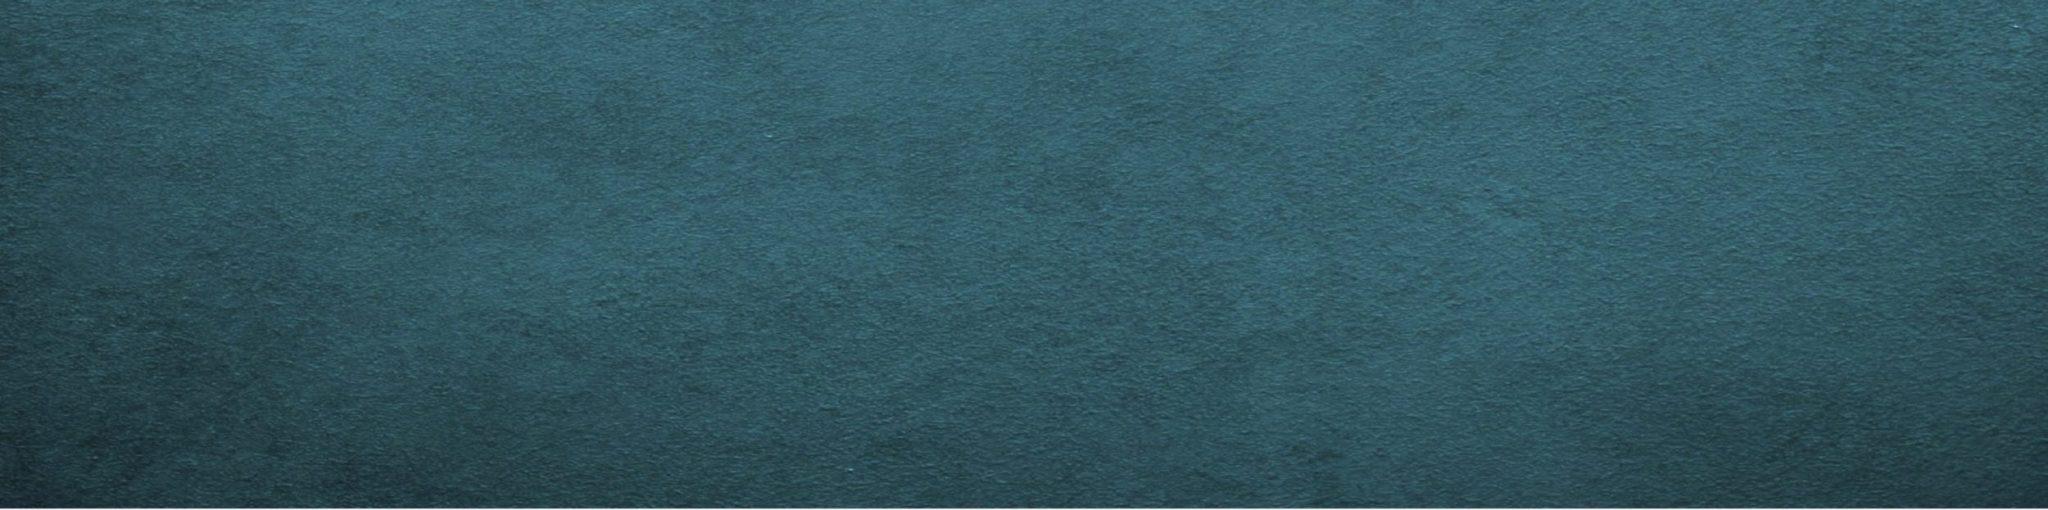 Roma Creative Contest blue background texture